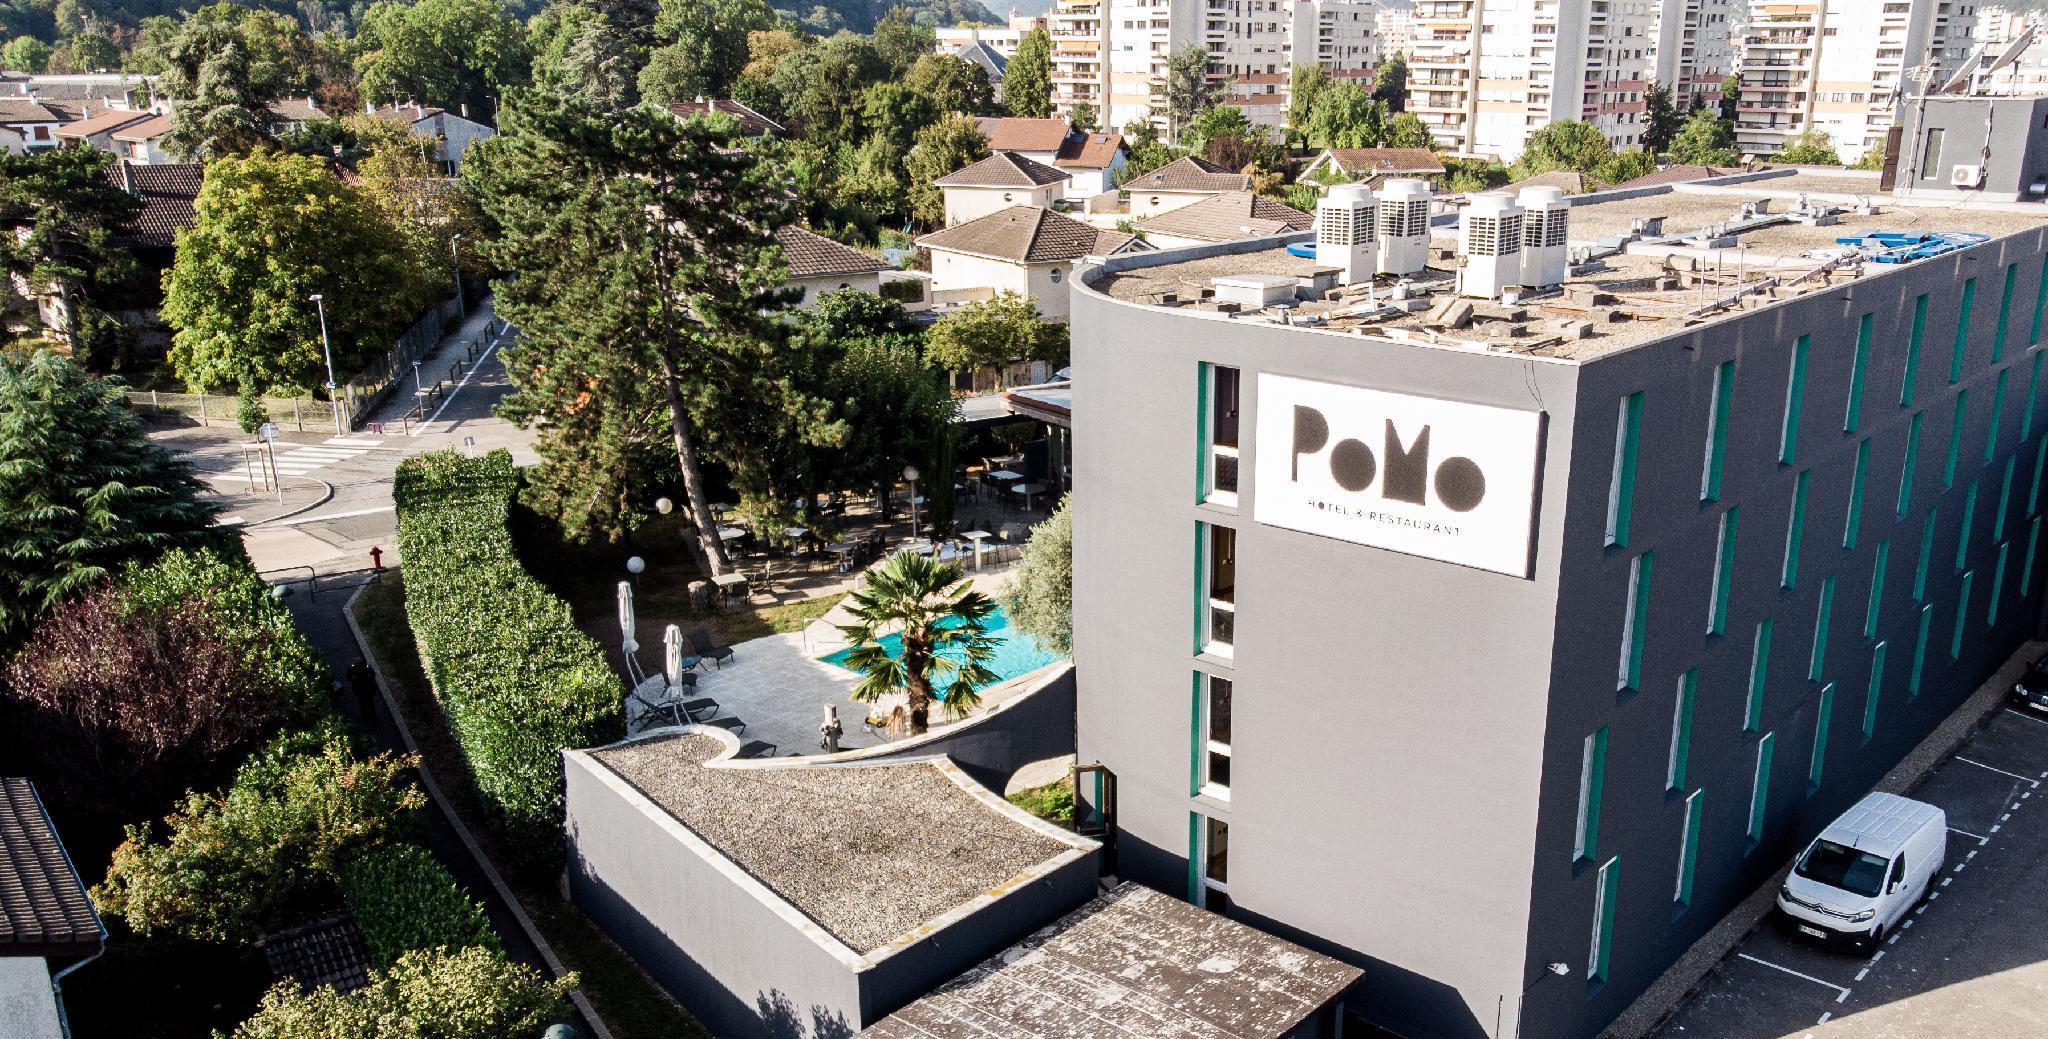 POMO Hotel And Restaurant